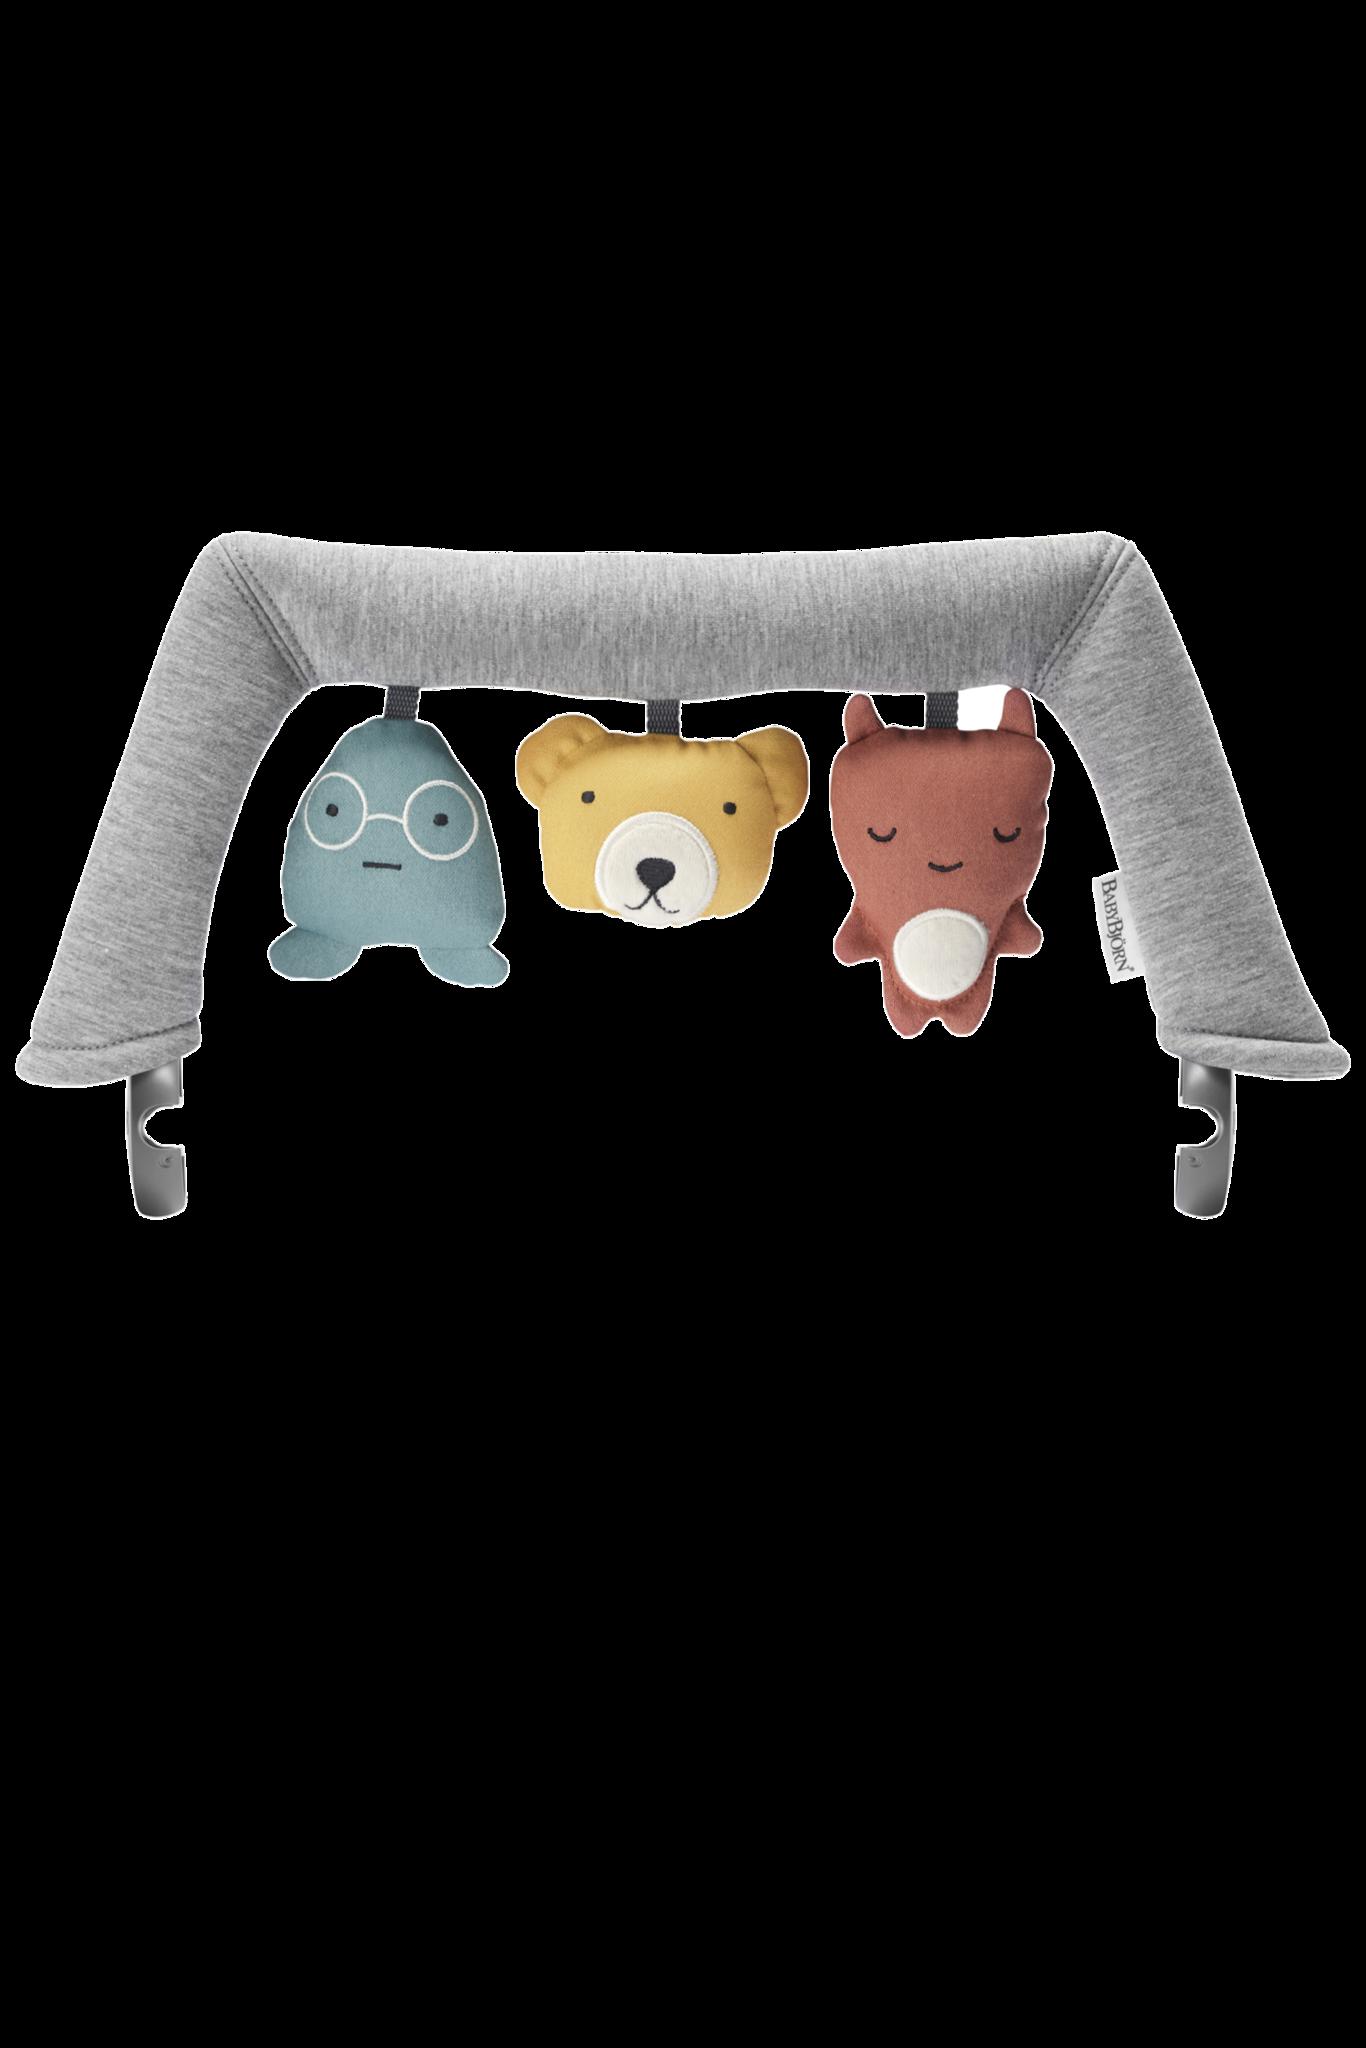 BabyBjorn BabyBjorn Bouncer Soft Friends Toy